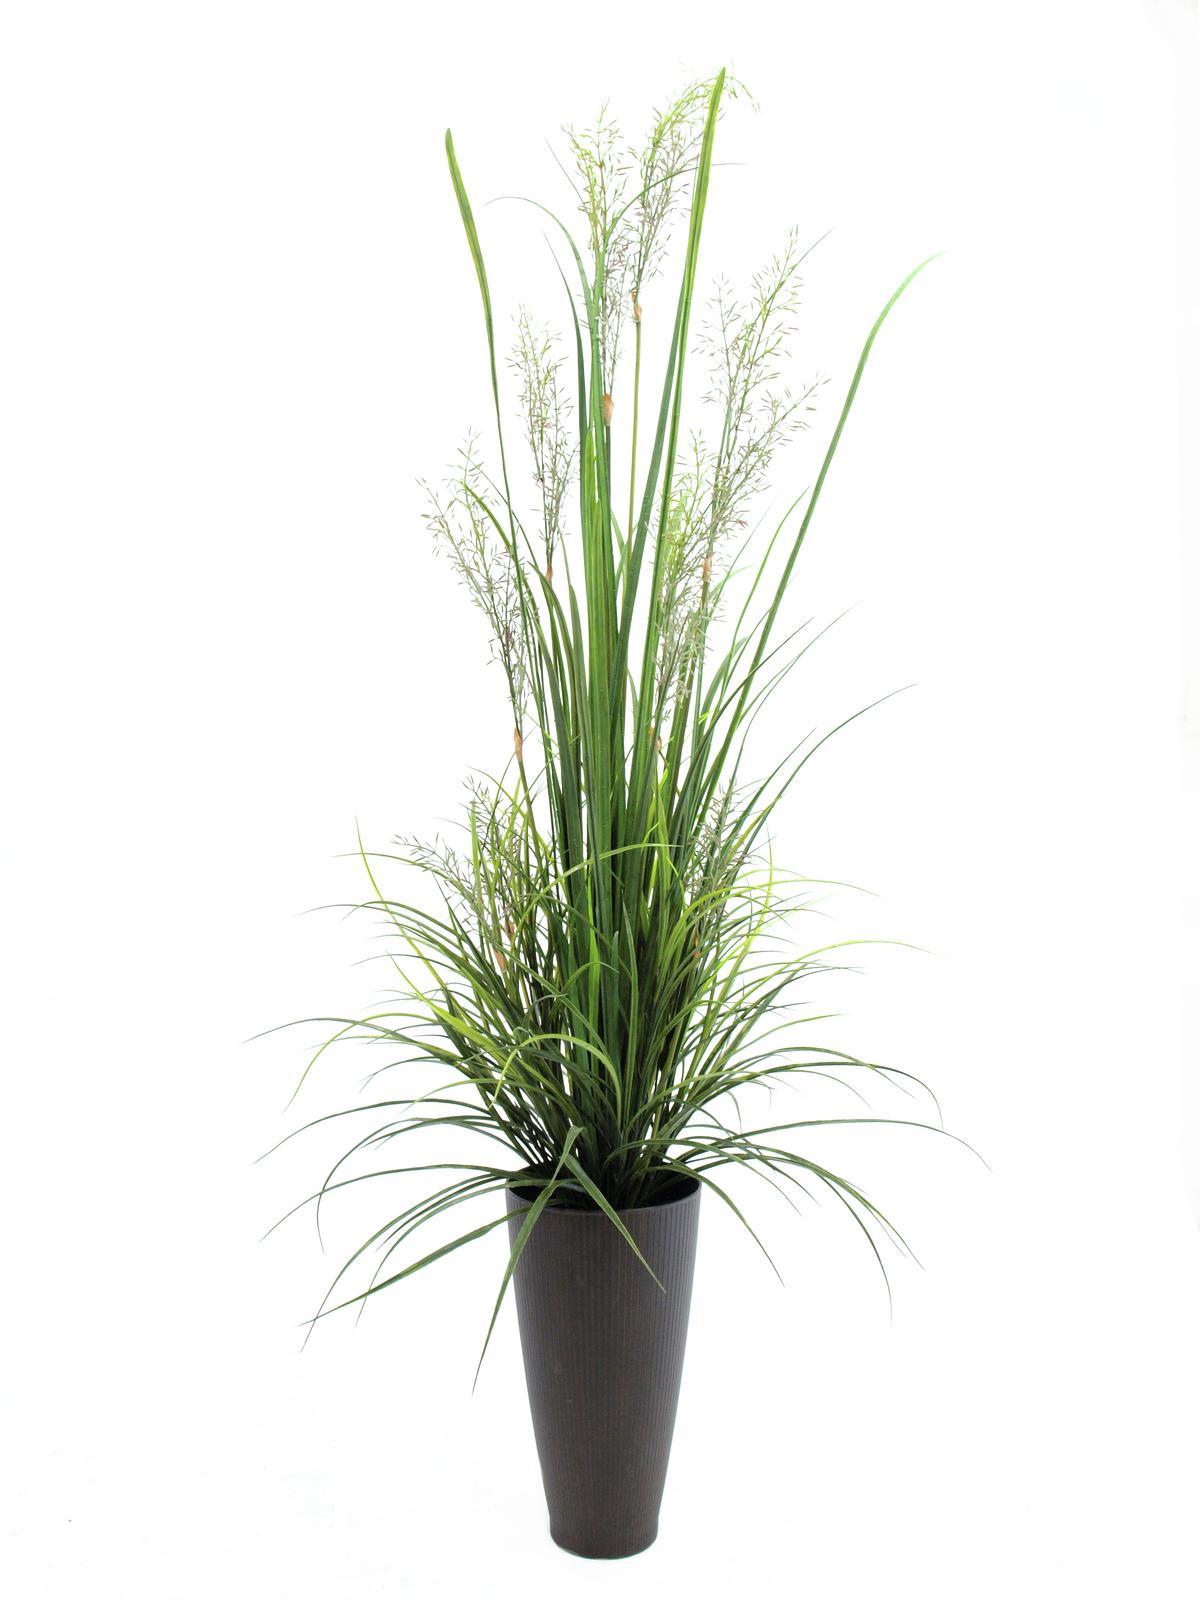 EUROPALMS Fiume di erba aprile, 175cm